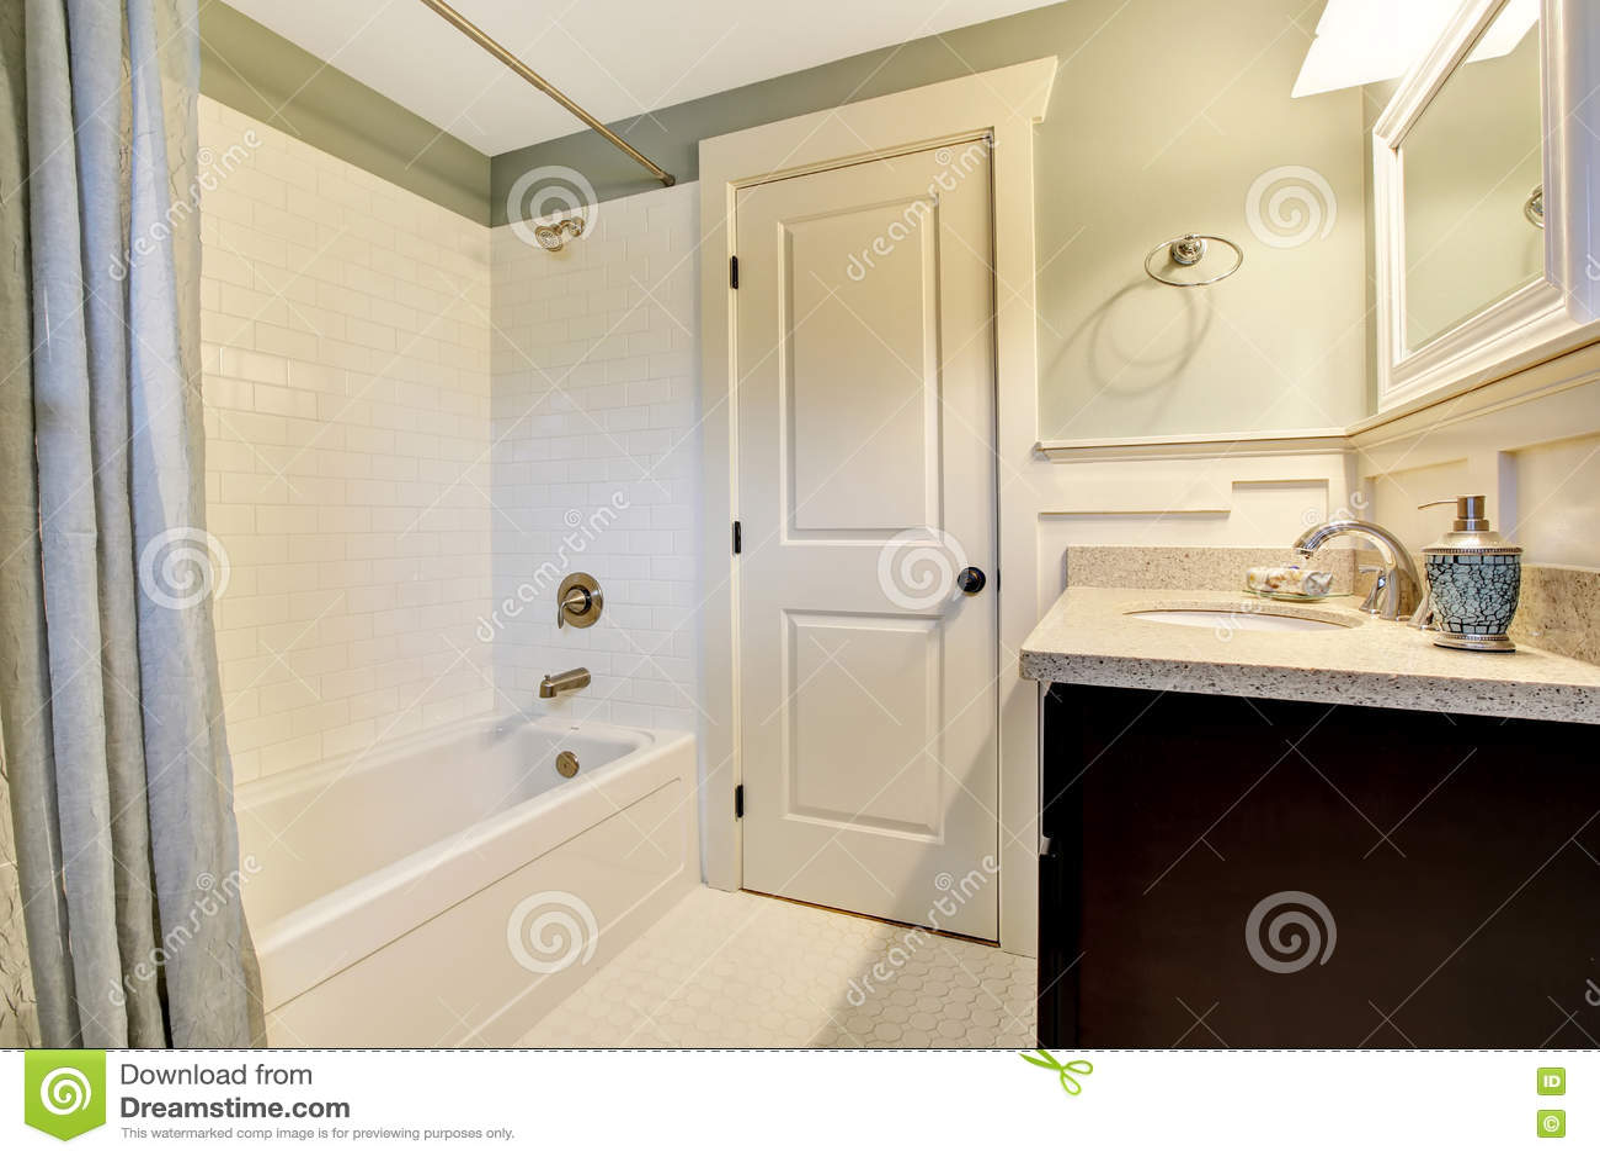 Bathroom Interior In White And Blue Tones With Black Vanity Cabi ...